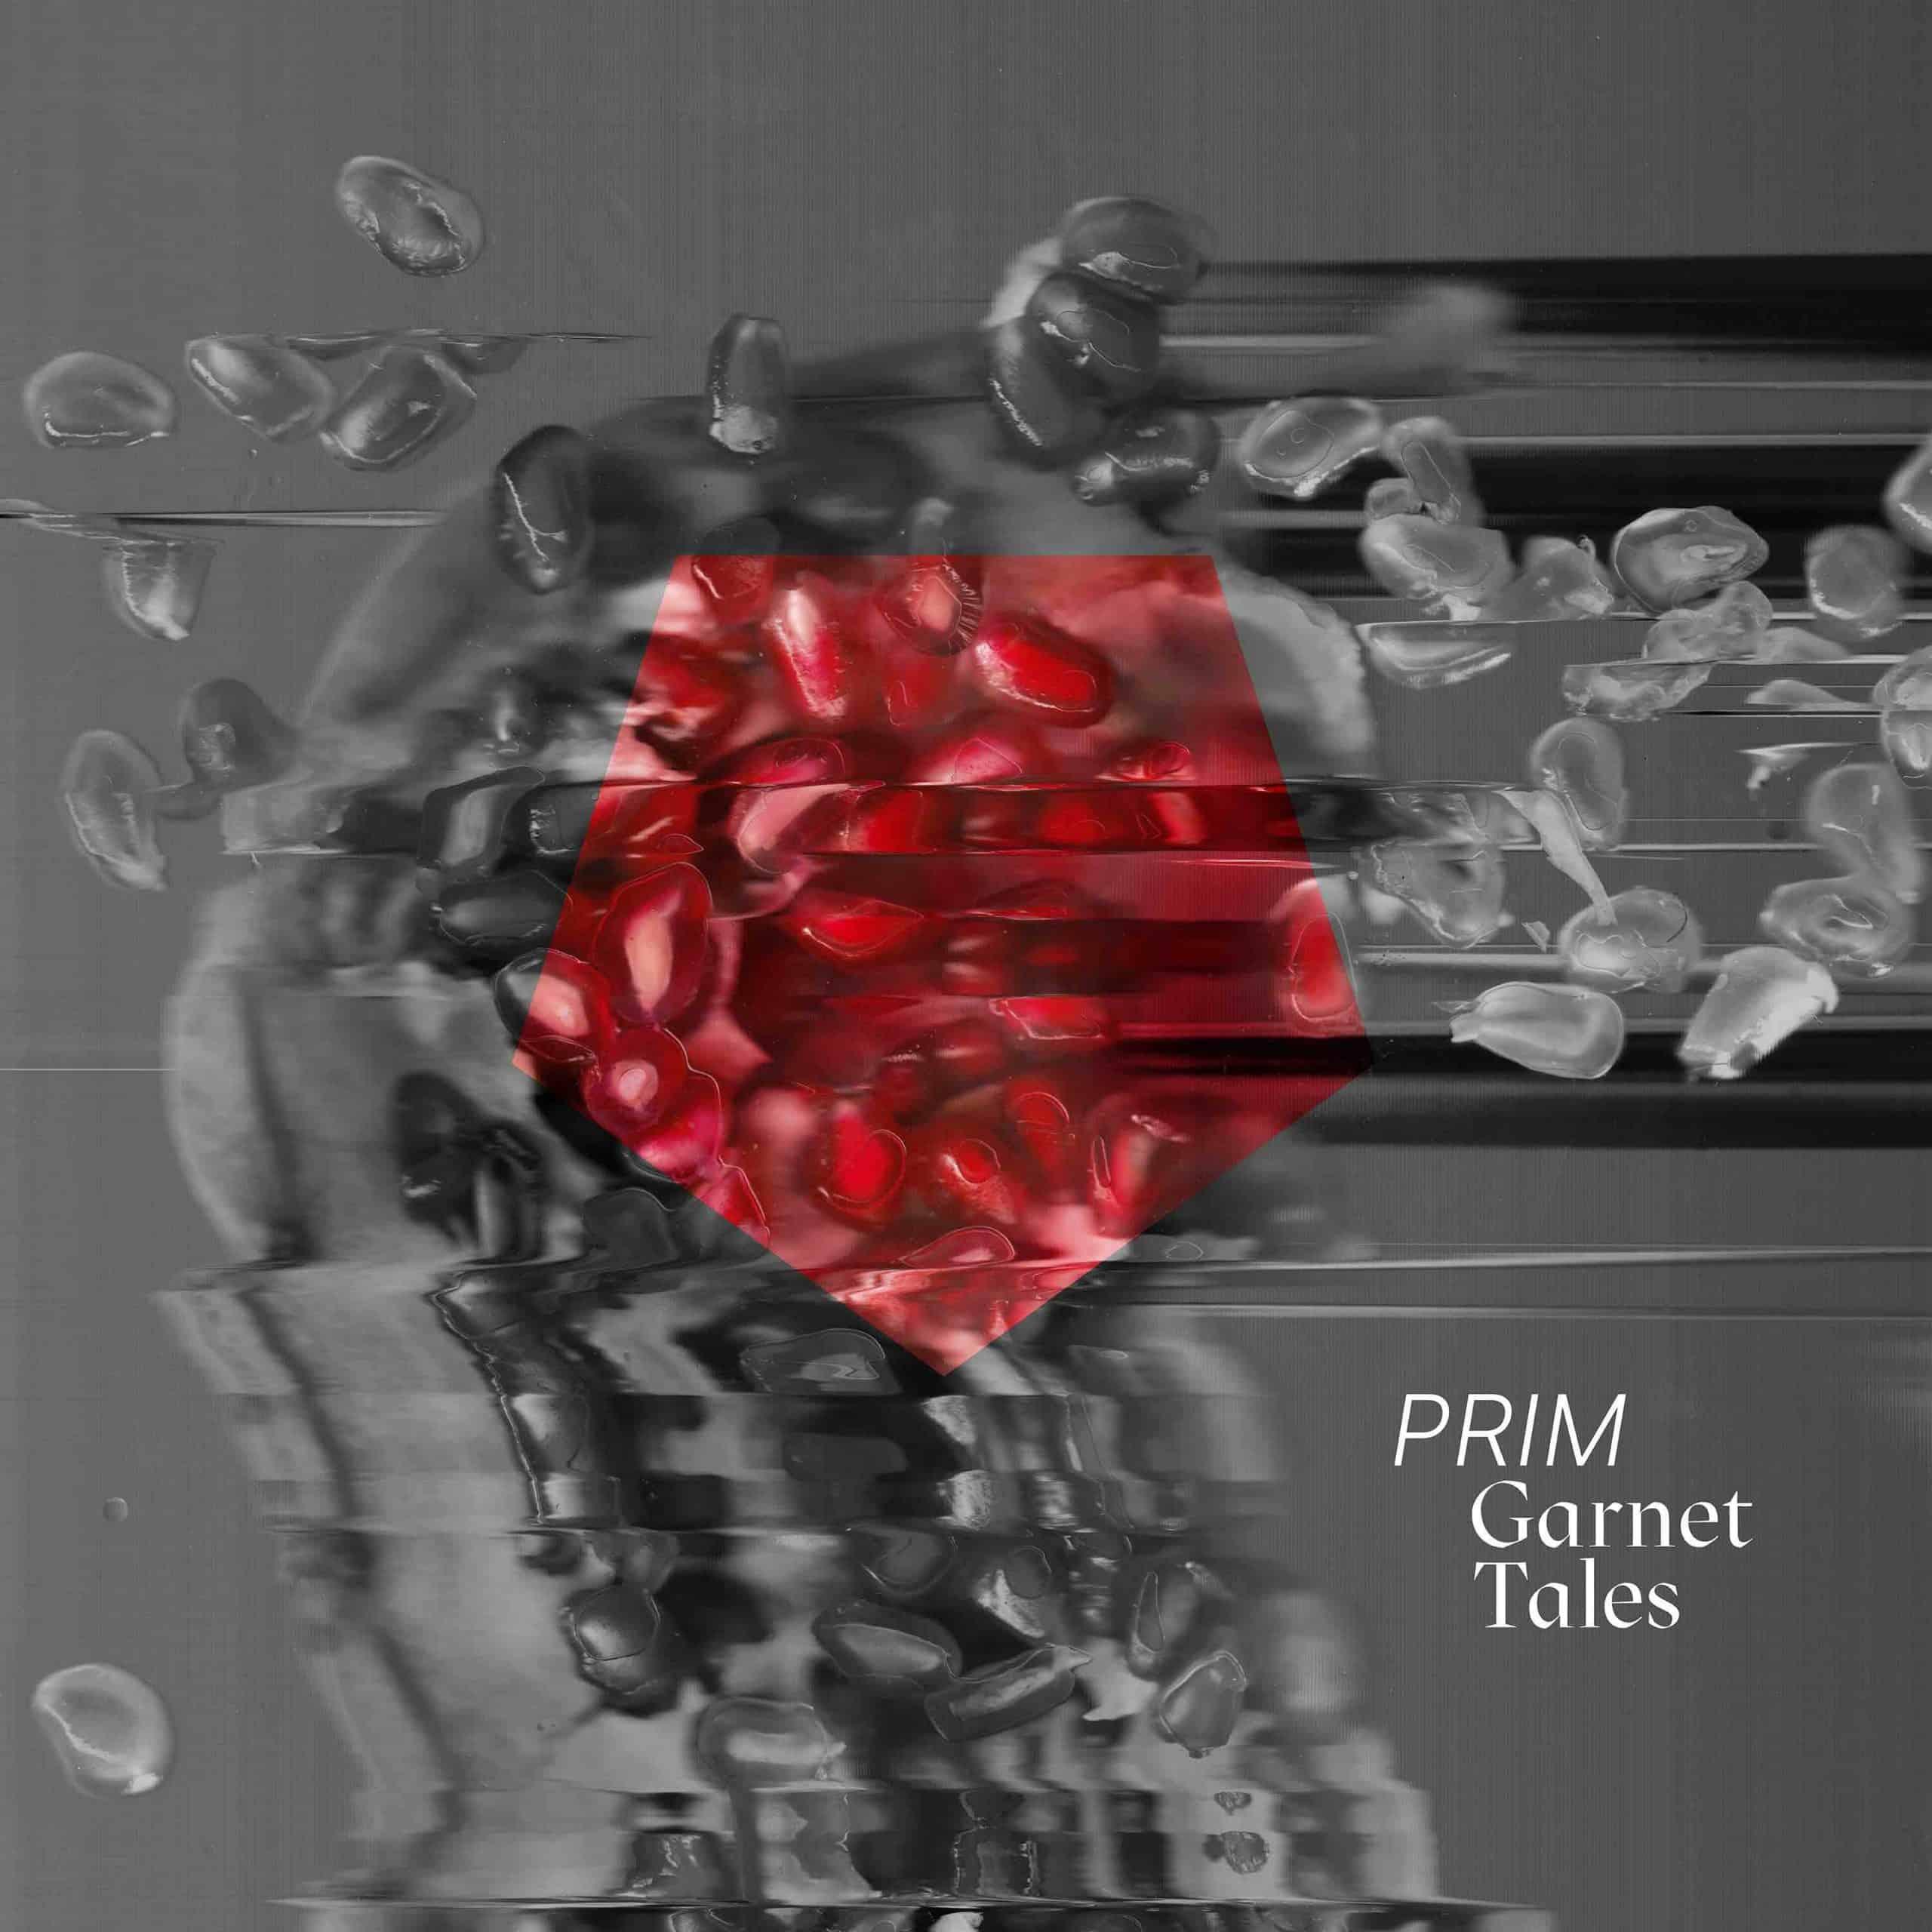 PRIM - Garnet Tales cover